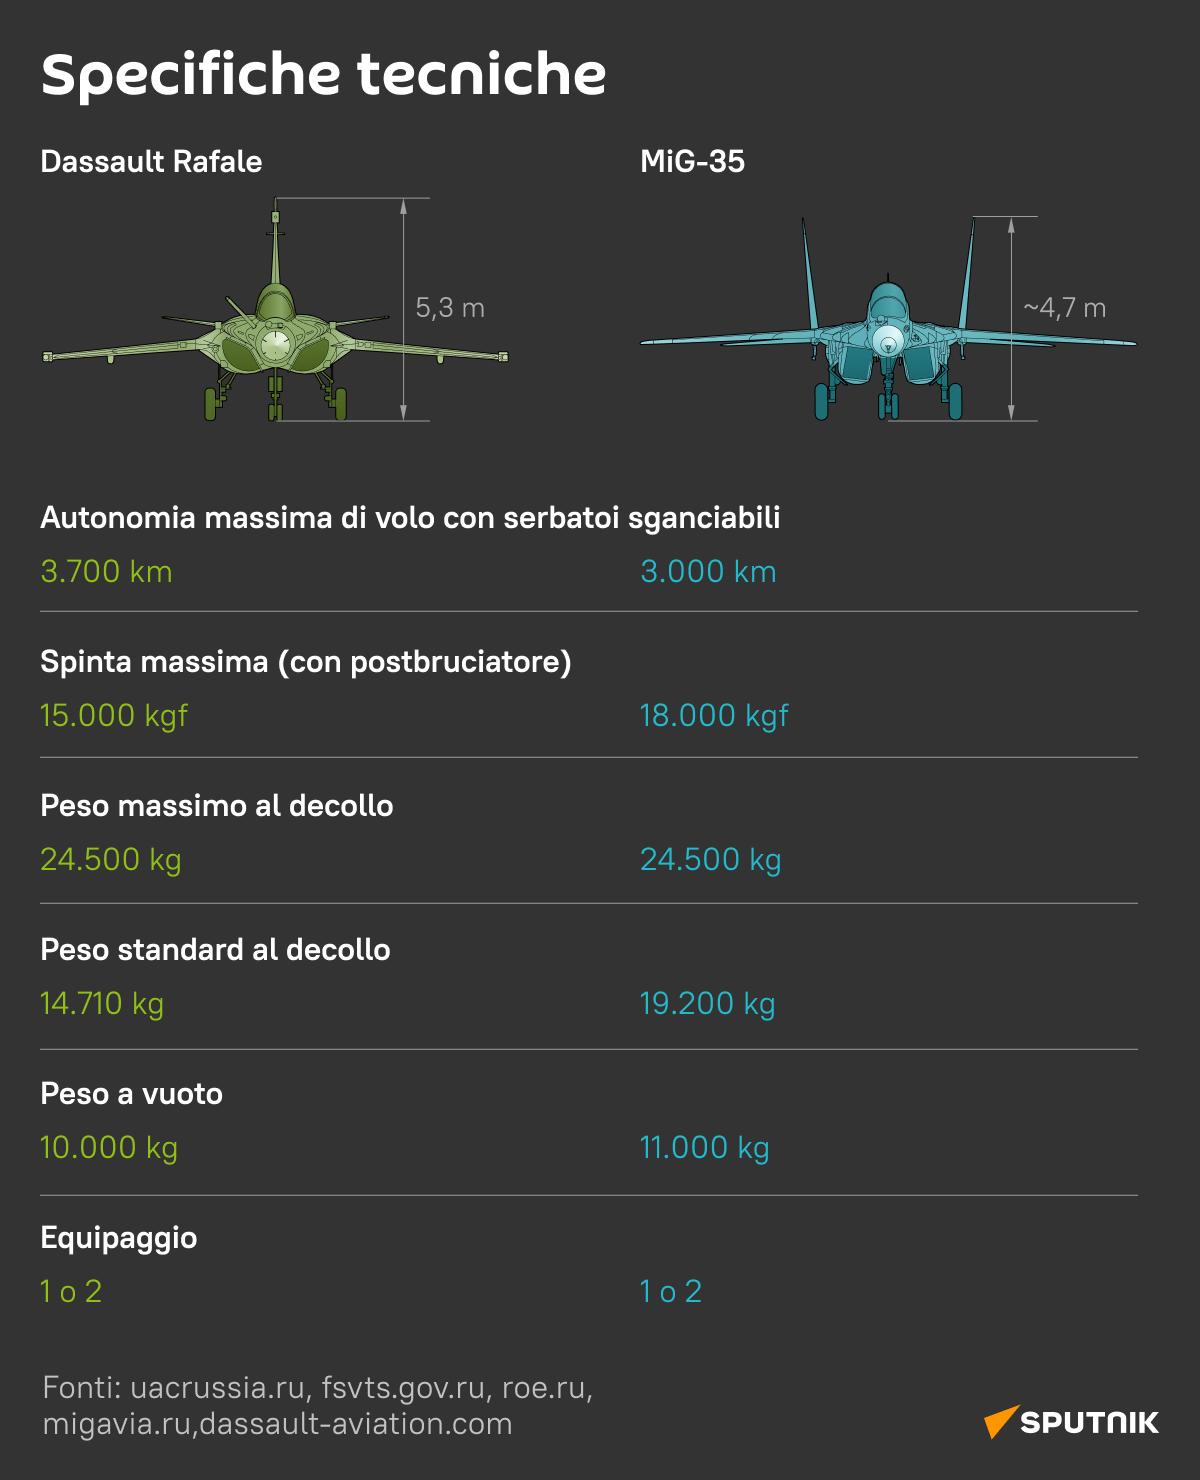 Il russo MiG-35 vs il francese Rafale 2 - Sputnik Italia